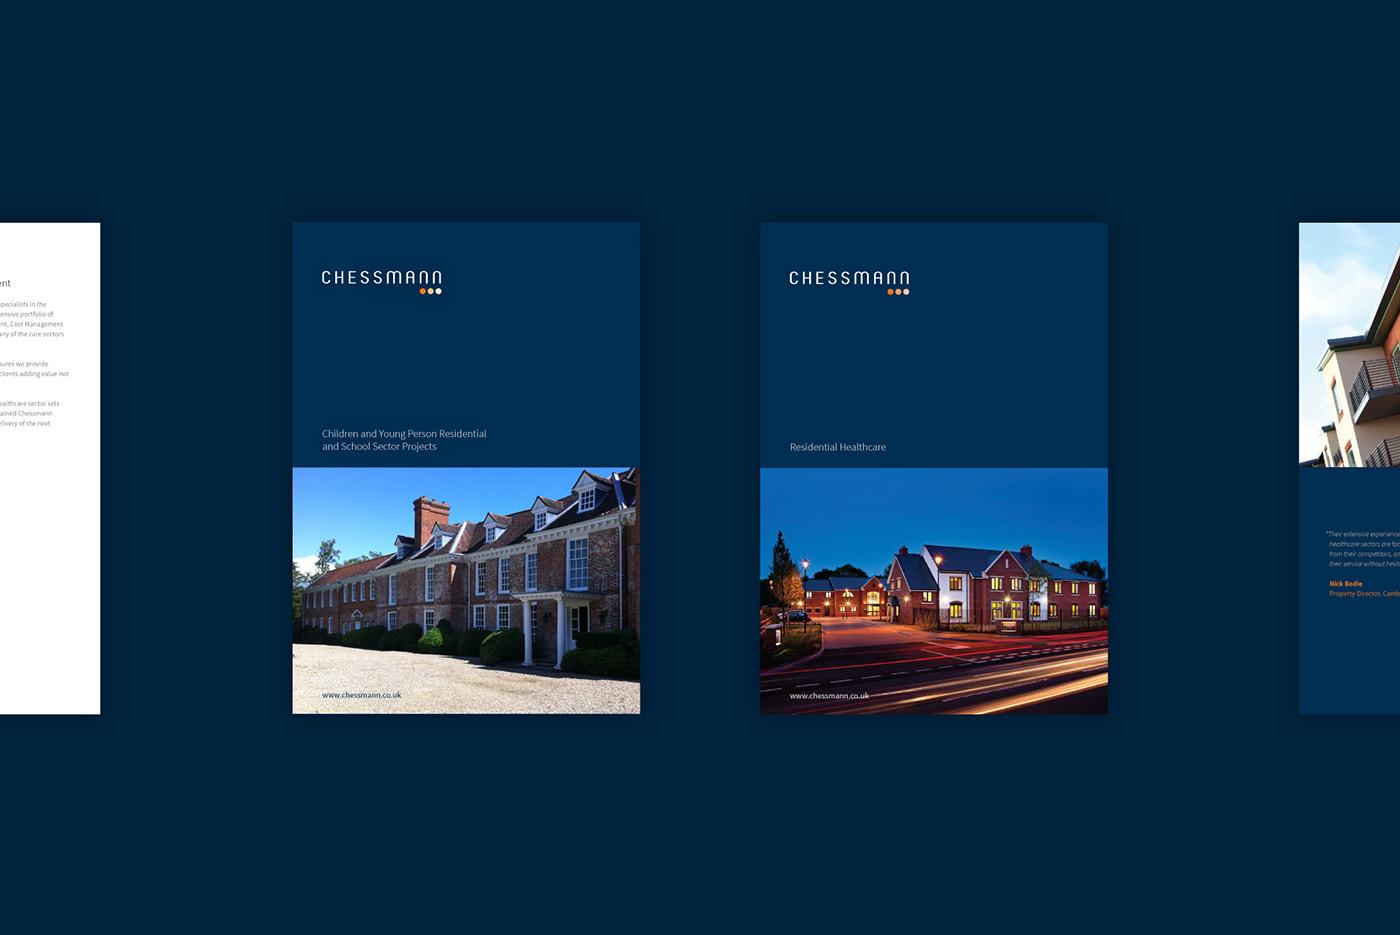 construction cardiff wales design Web brochure blue